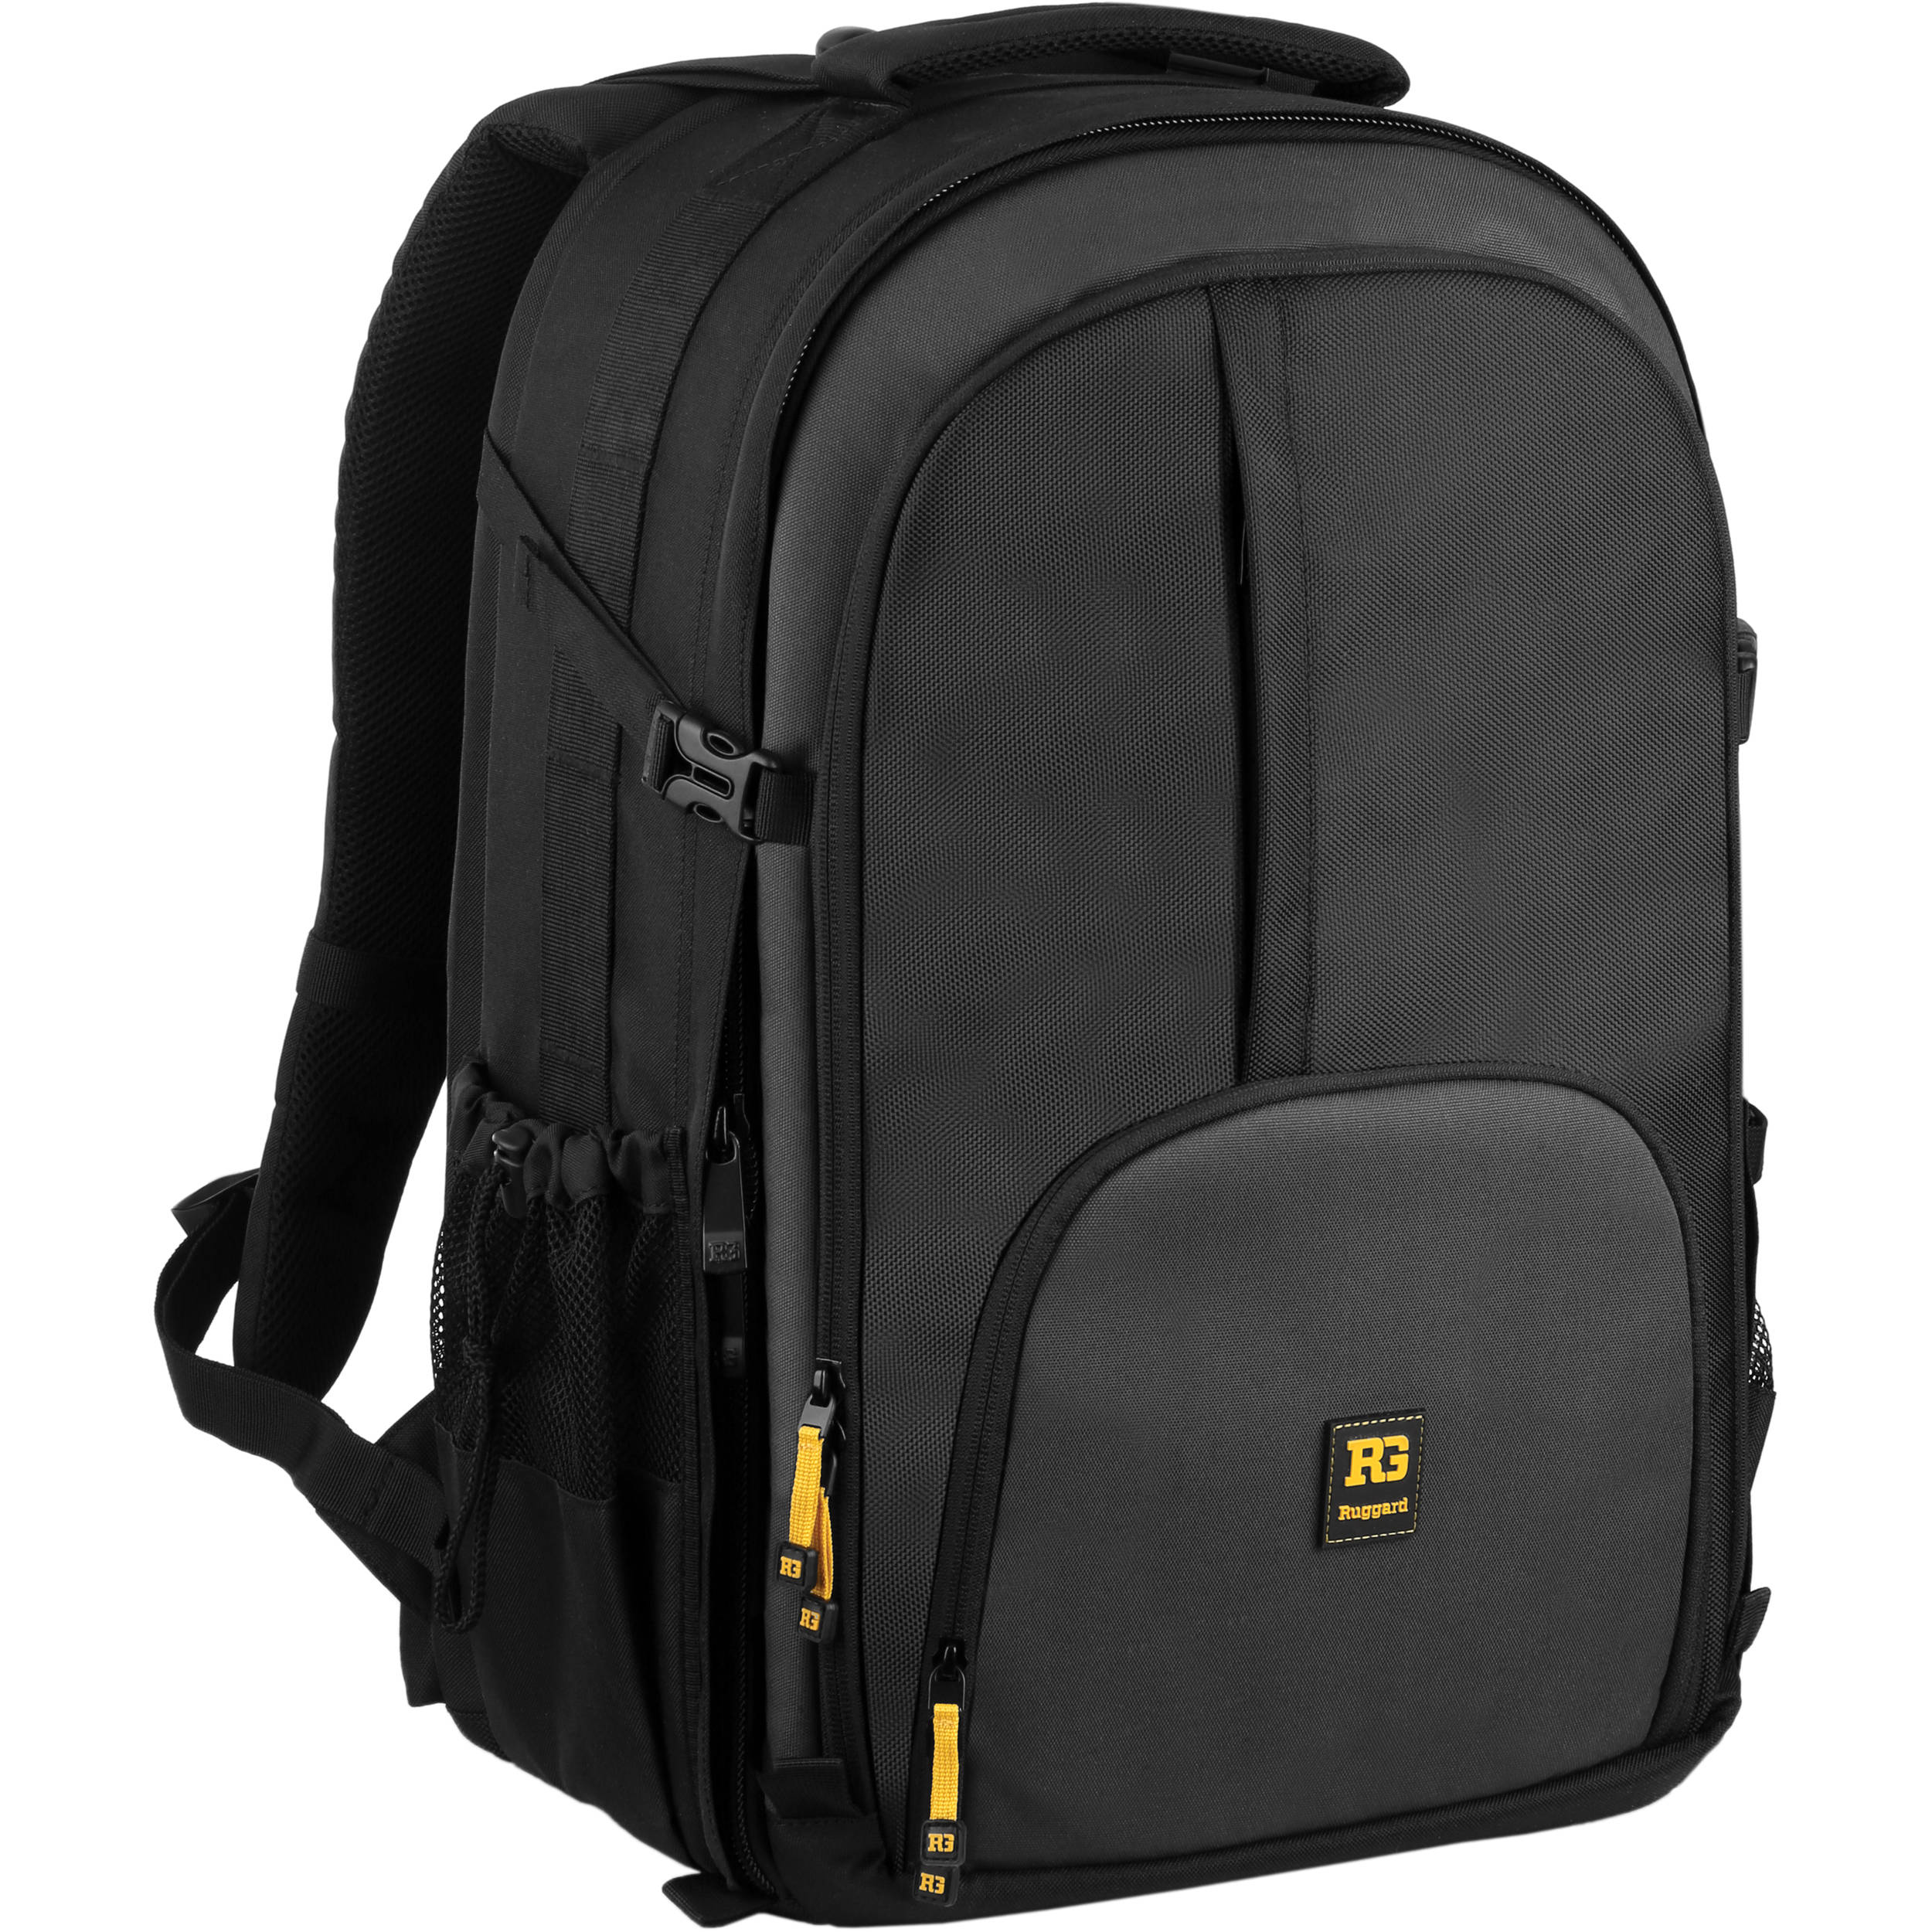 best 18 laptop backpack Backpack Tools